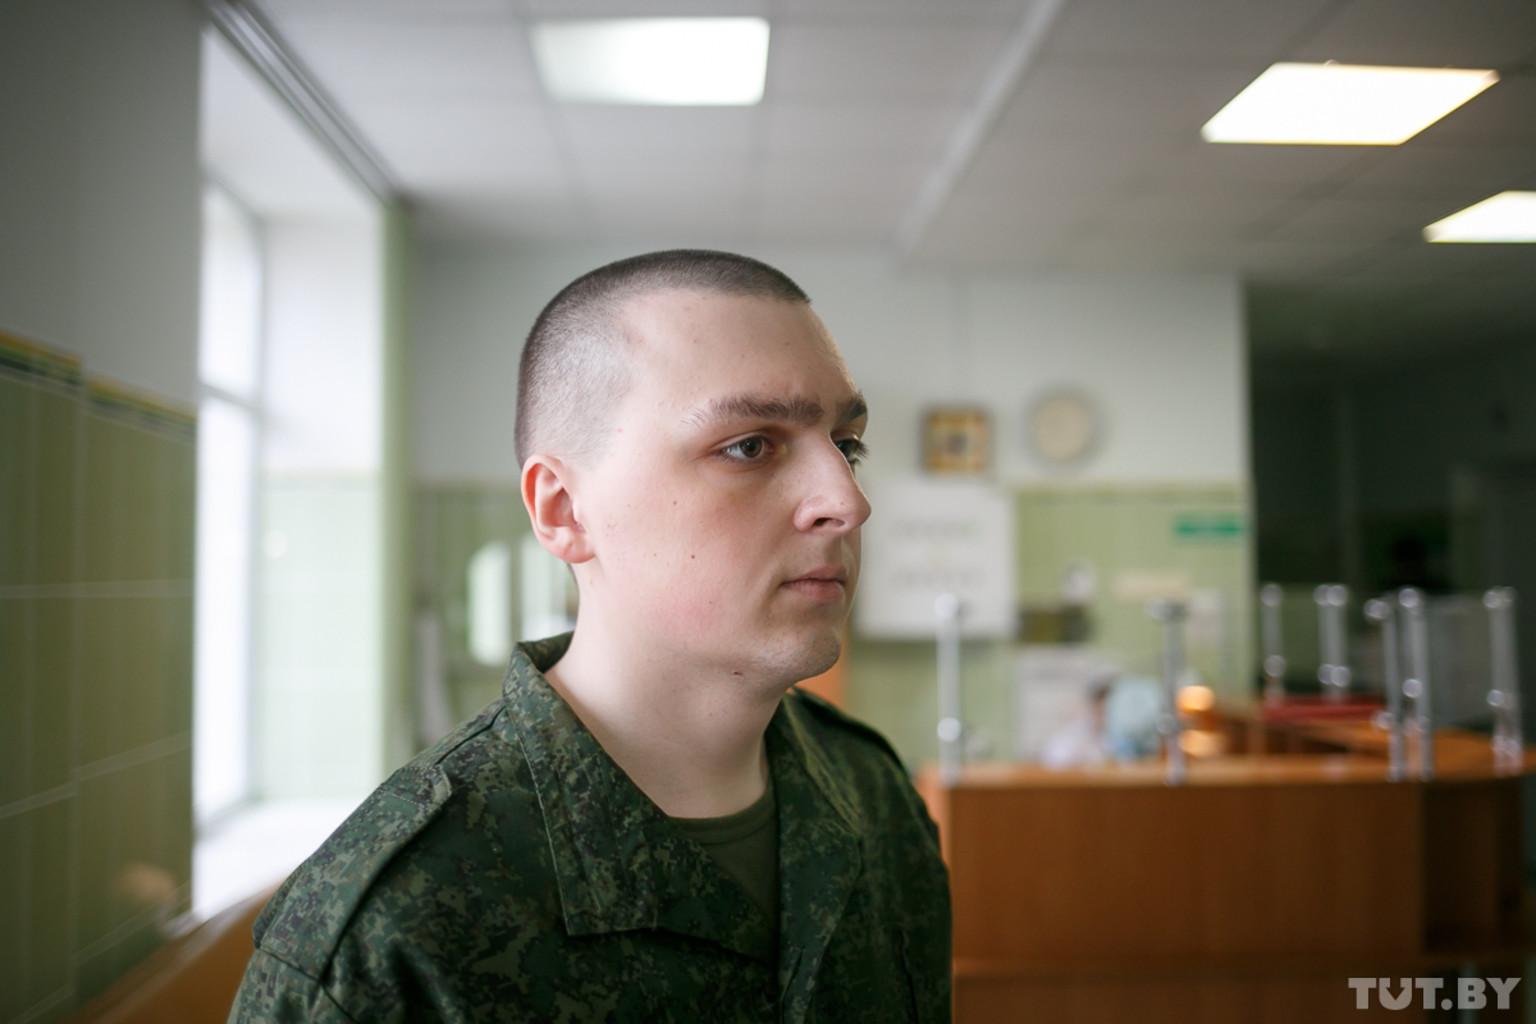 7 soldat i granata 15032019 zam tutby phsl